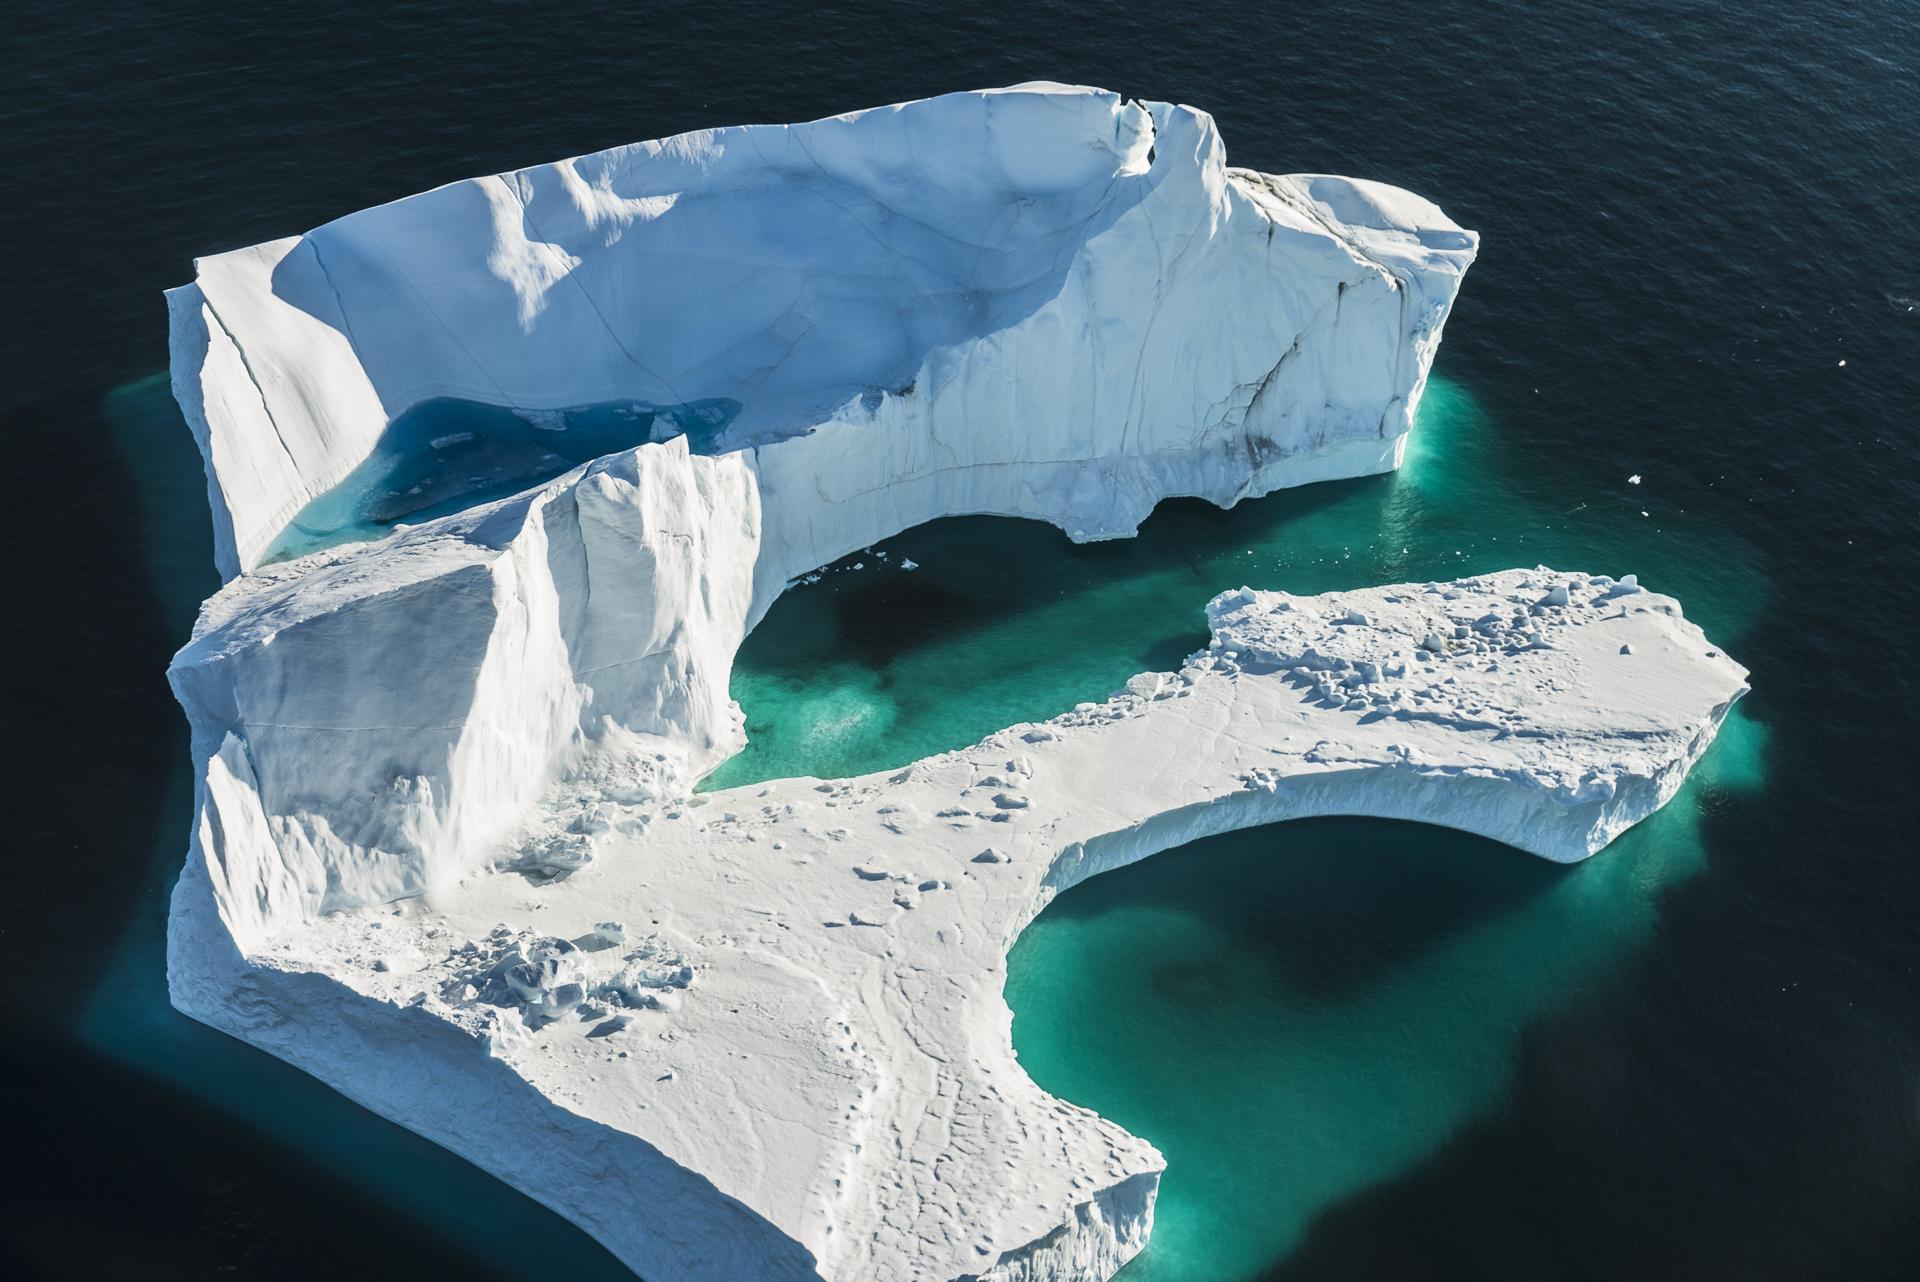 32.Defibaugh_Greenland_Uummannaq_b_5.jpg